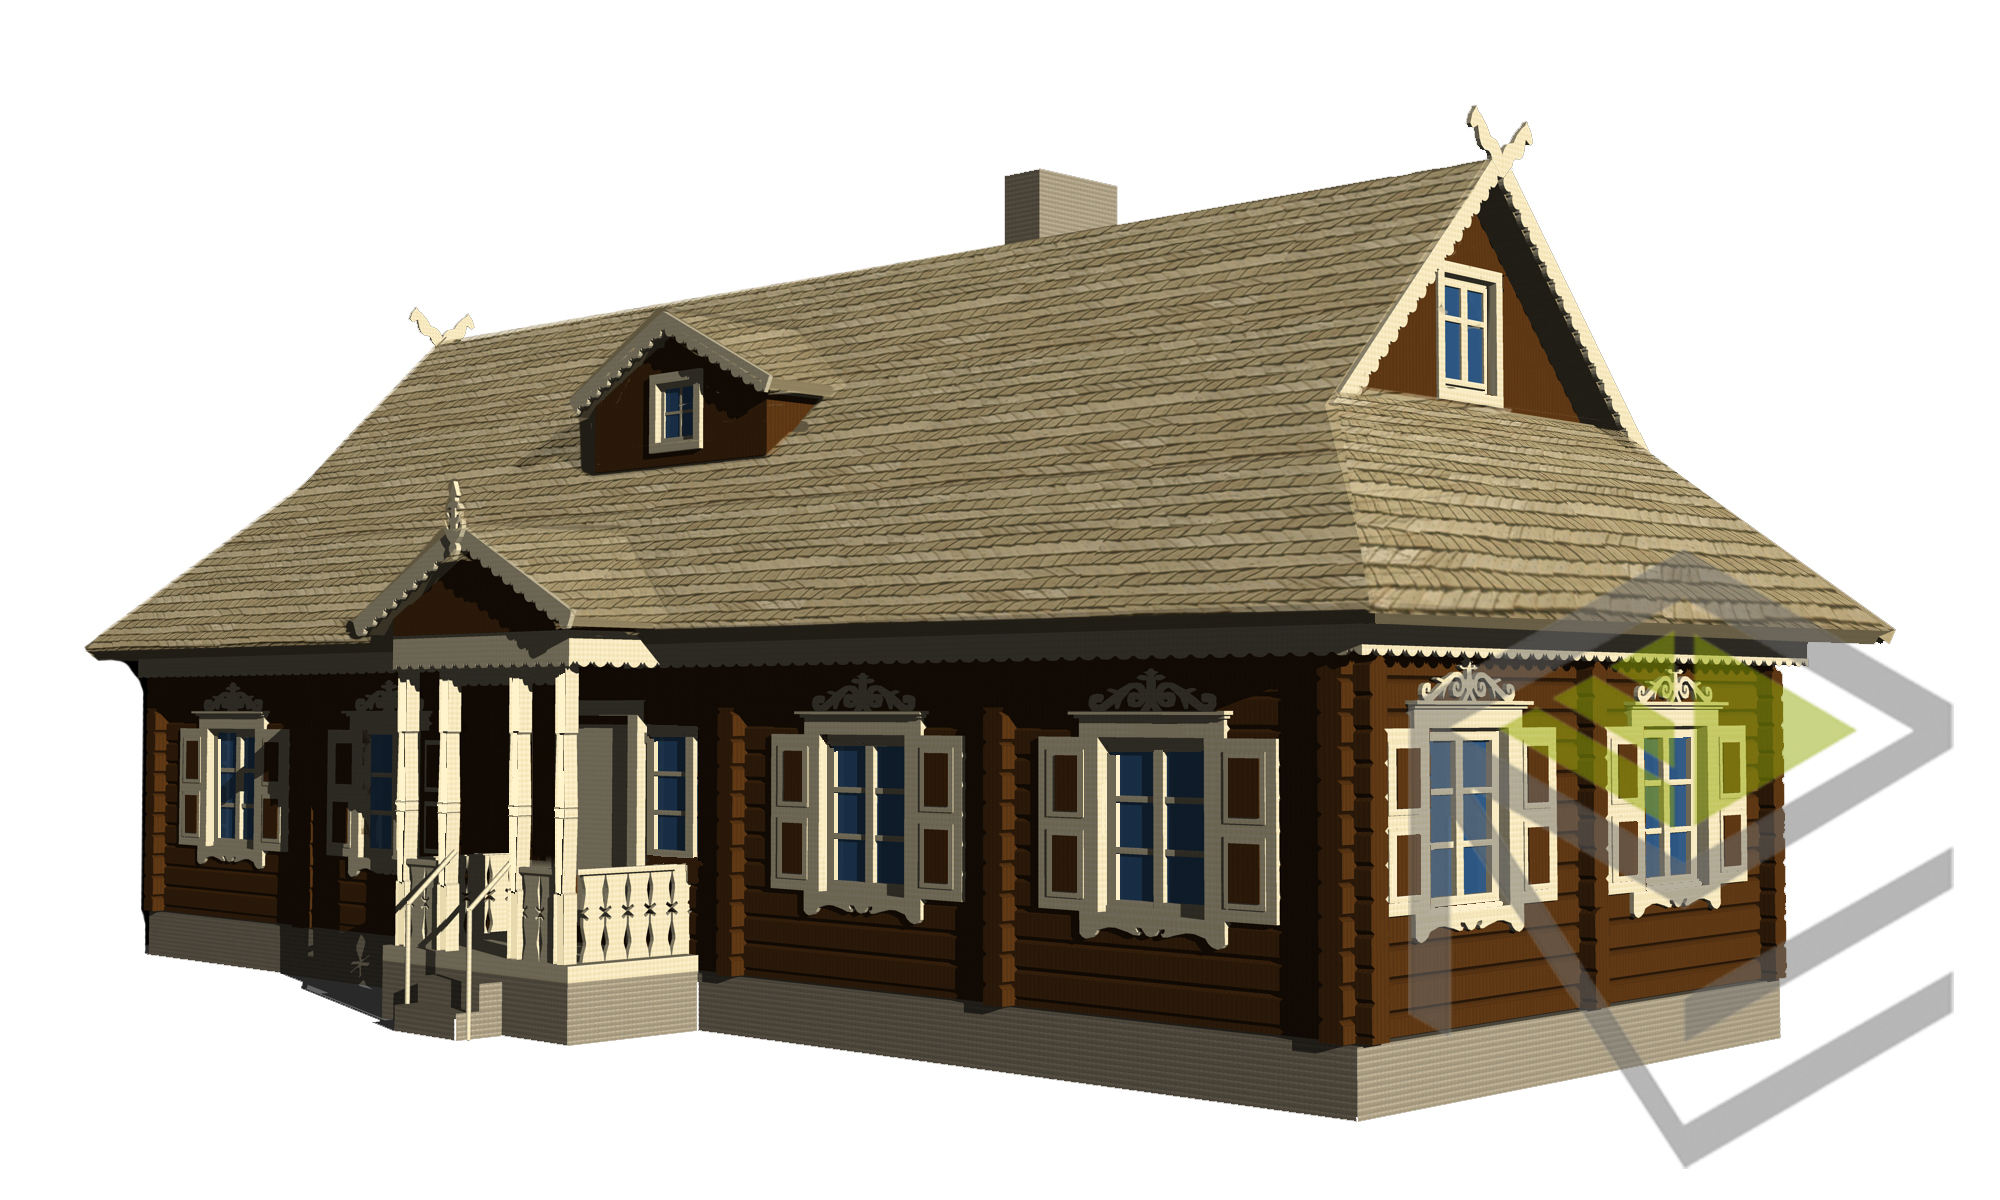 a-klases-namu-projektavima-etnografiniai-namai-architekte-svajone-pociene-2